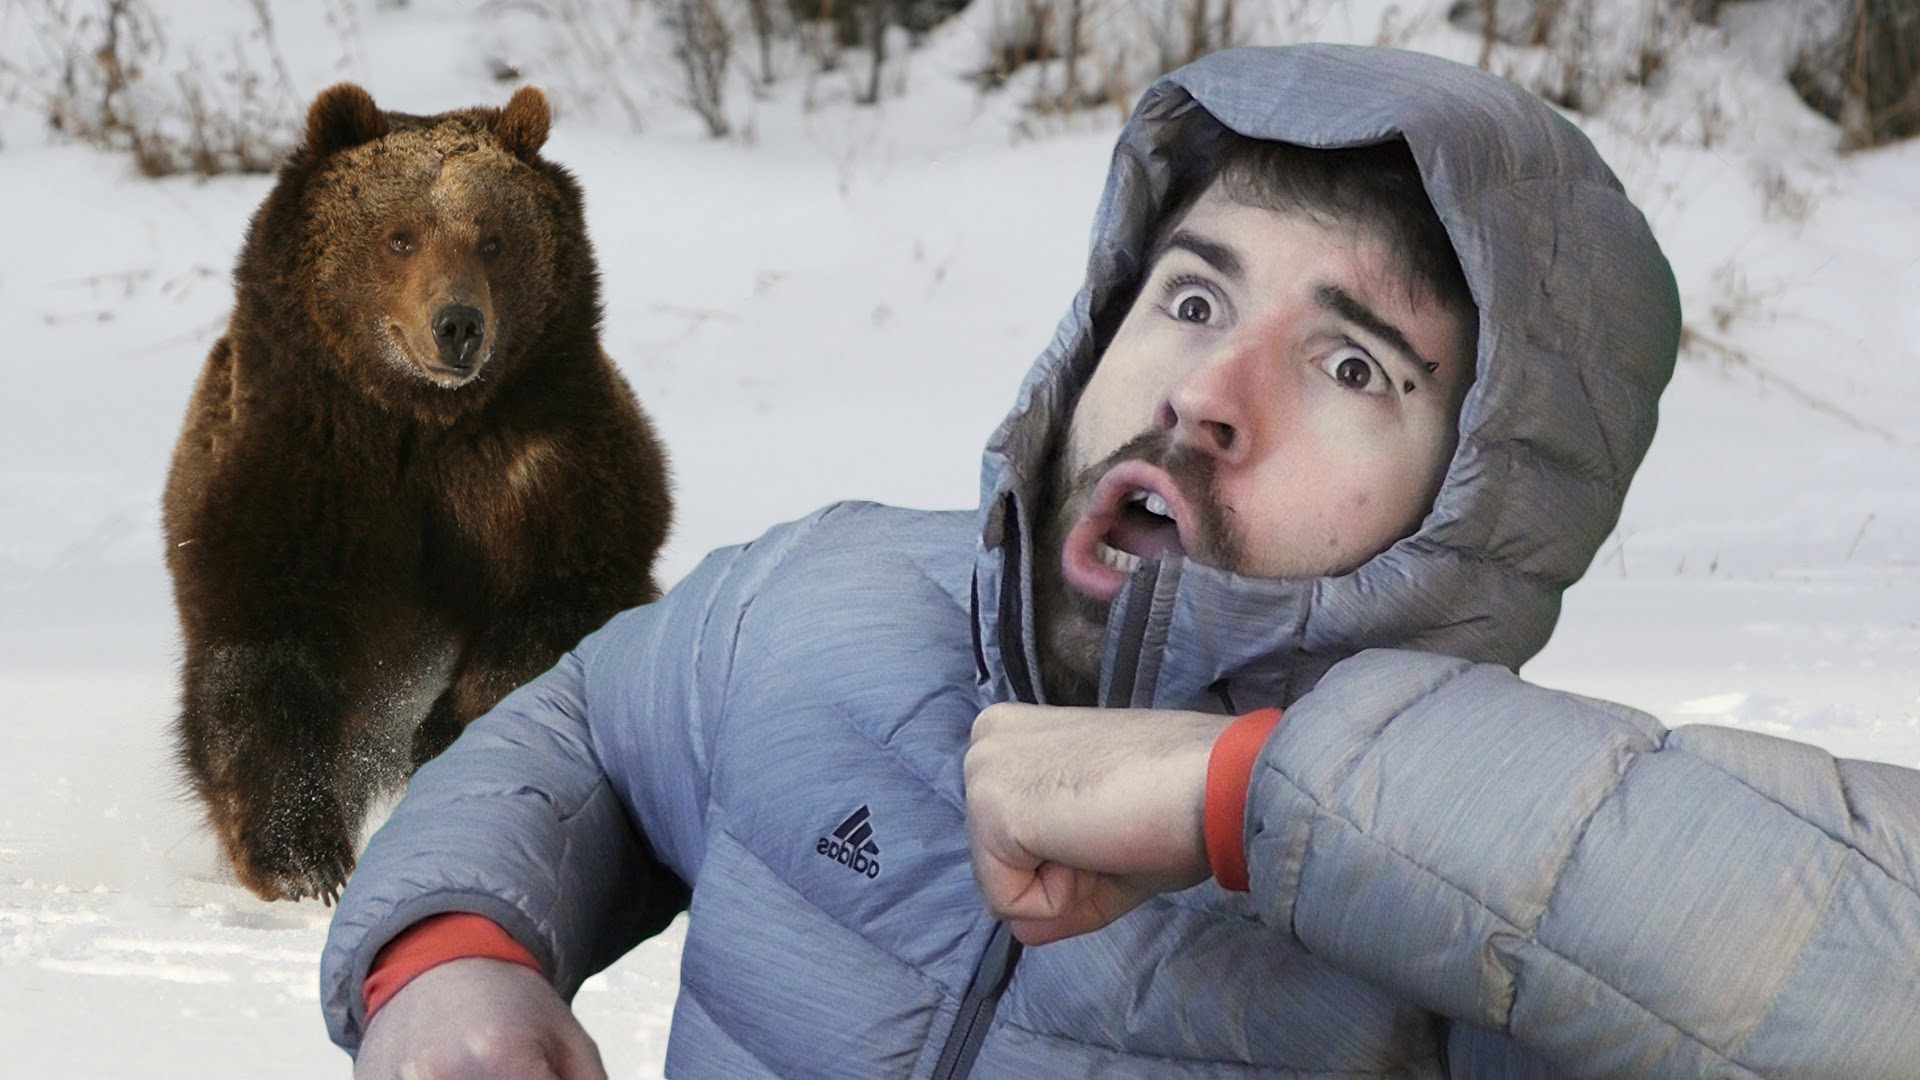 Картинка мужика с медведем